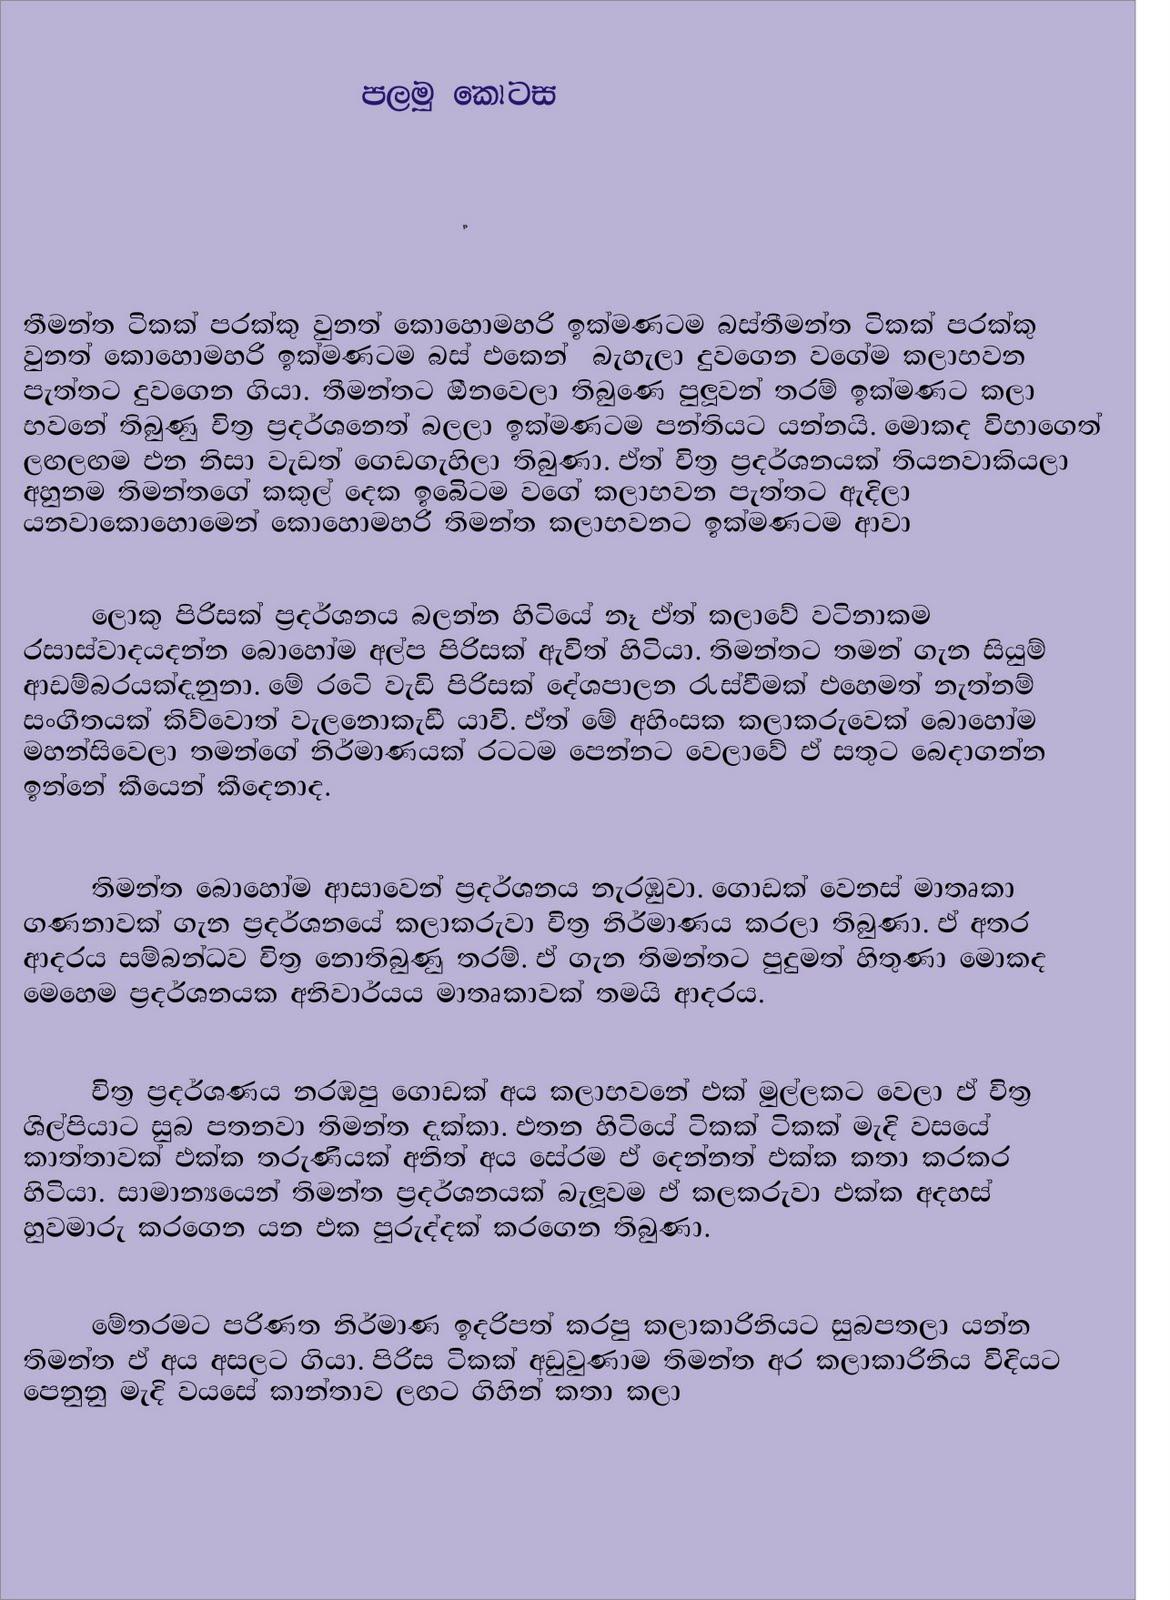 Sri lanka girl ane epaaaa - 5 3